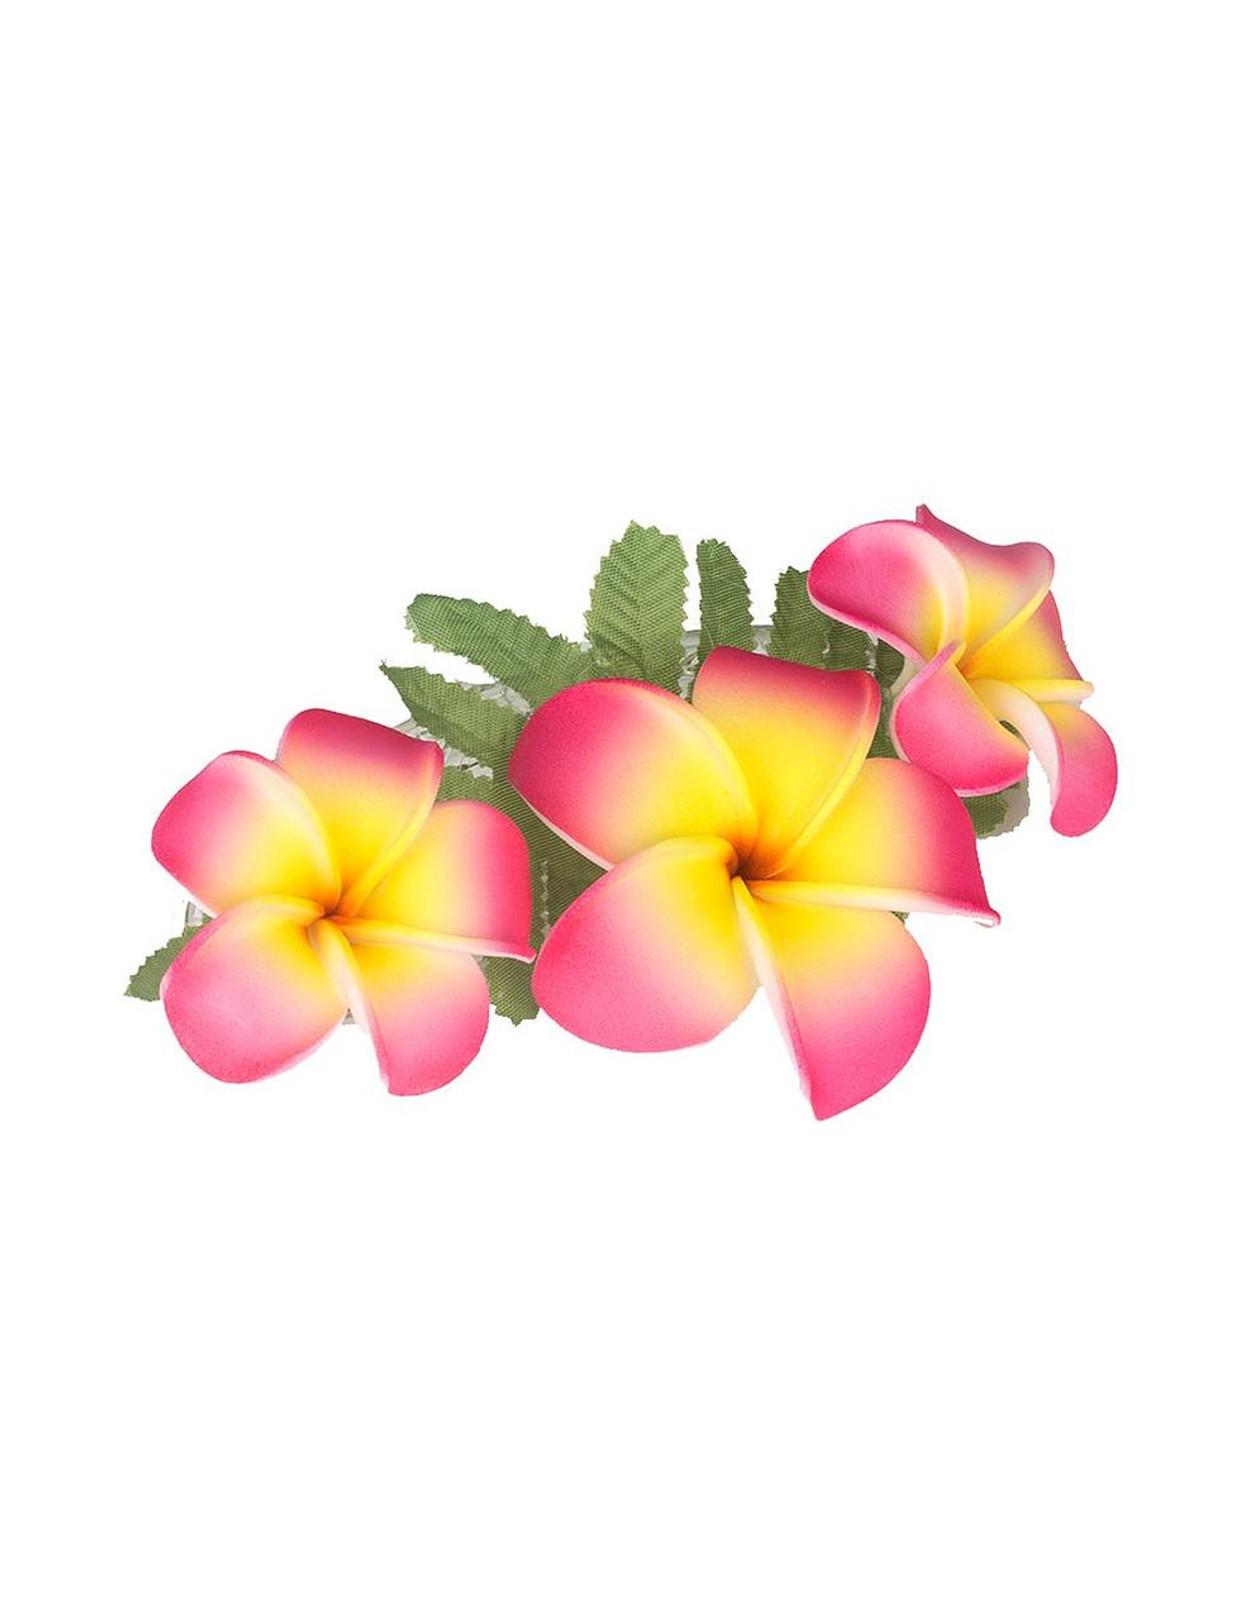 3 Plumerias Flower Cluster Pink Yellow Hair Clip Hawaiian Wedding